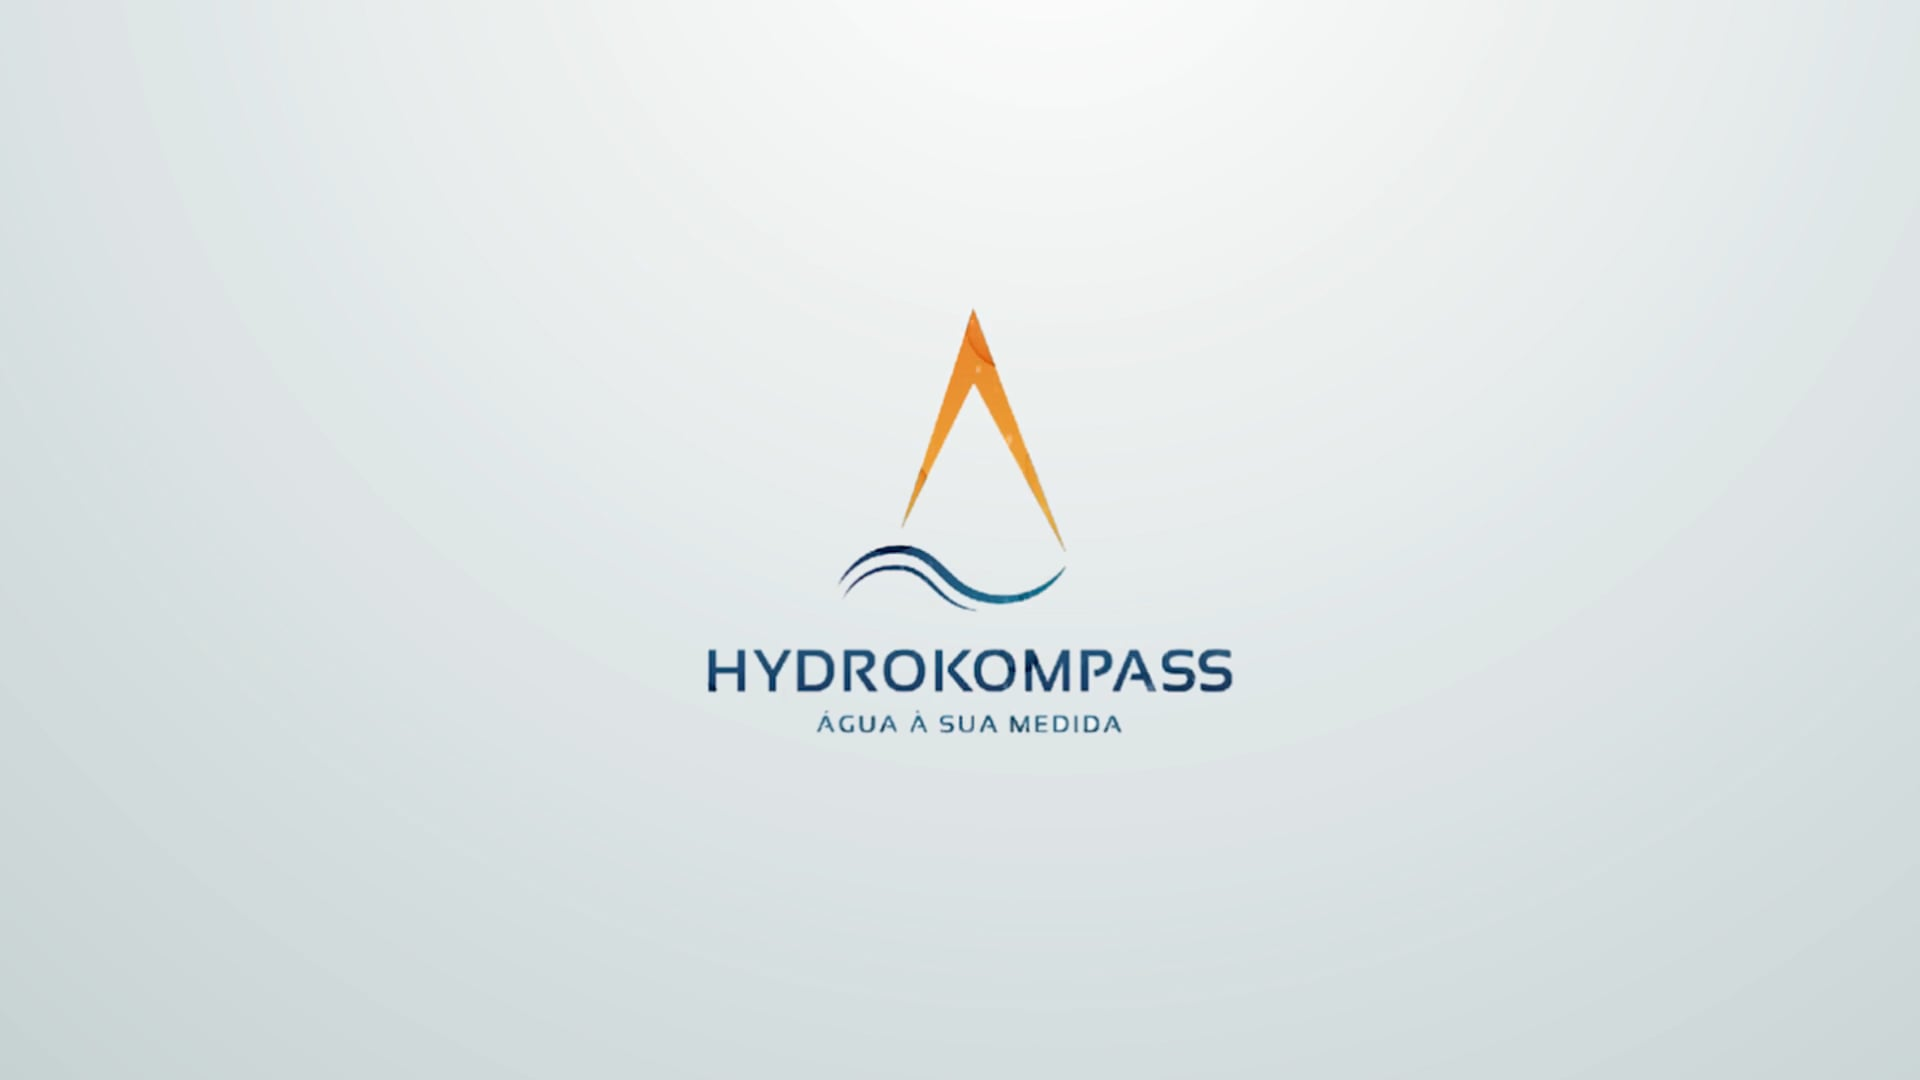 Hydrokompass - Institucional